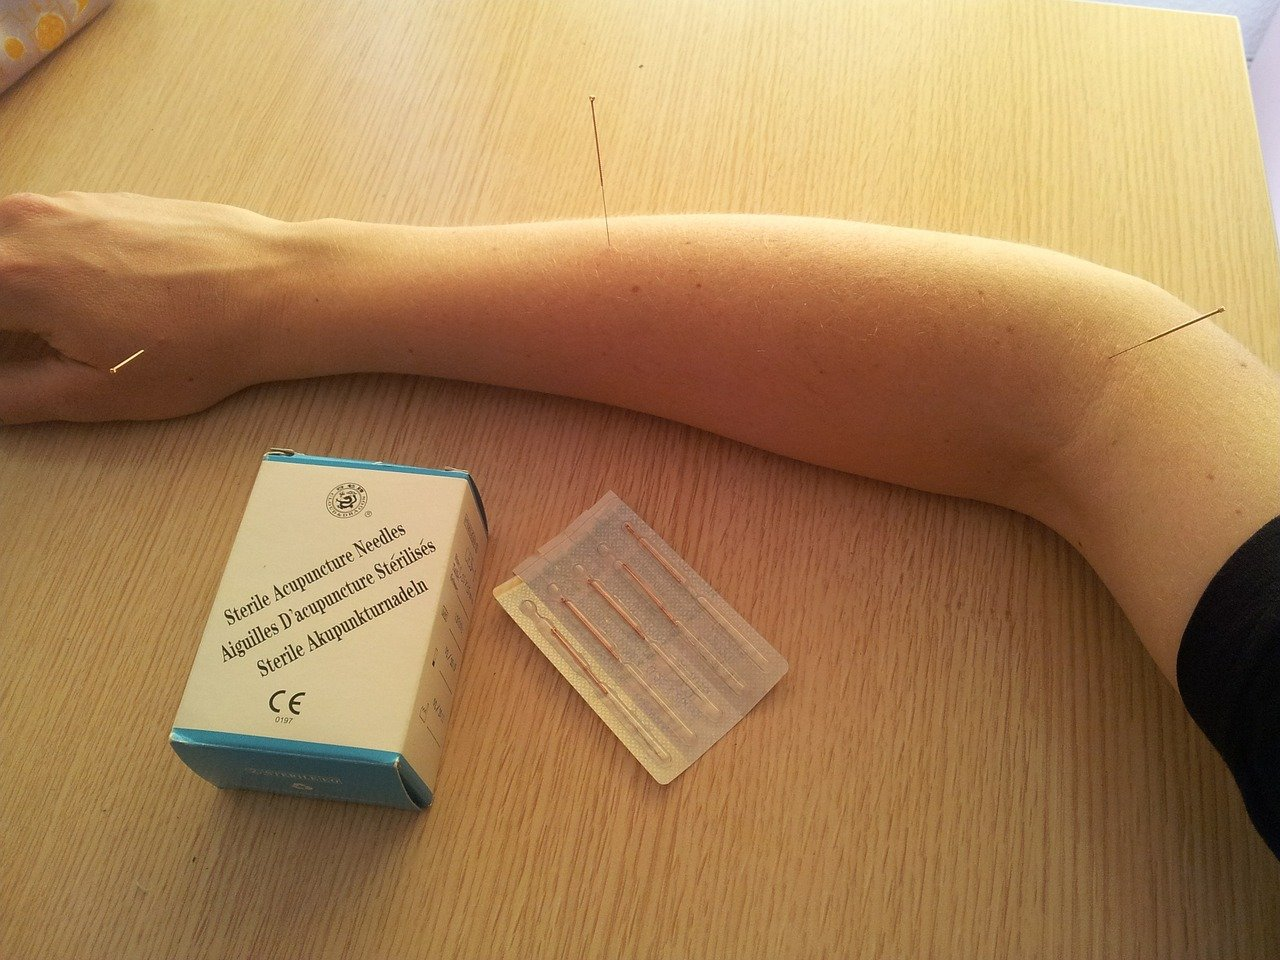 Fysiotherapie Sportplaza fysio manuele therapie